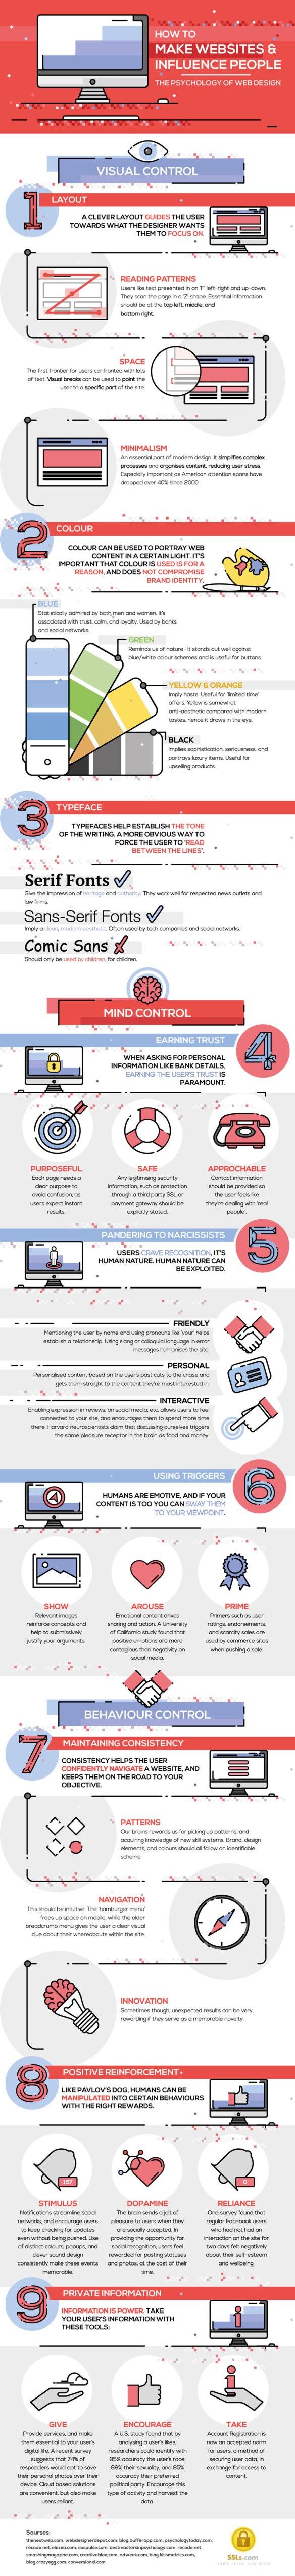 psychology-of-web-design